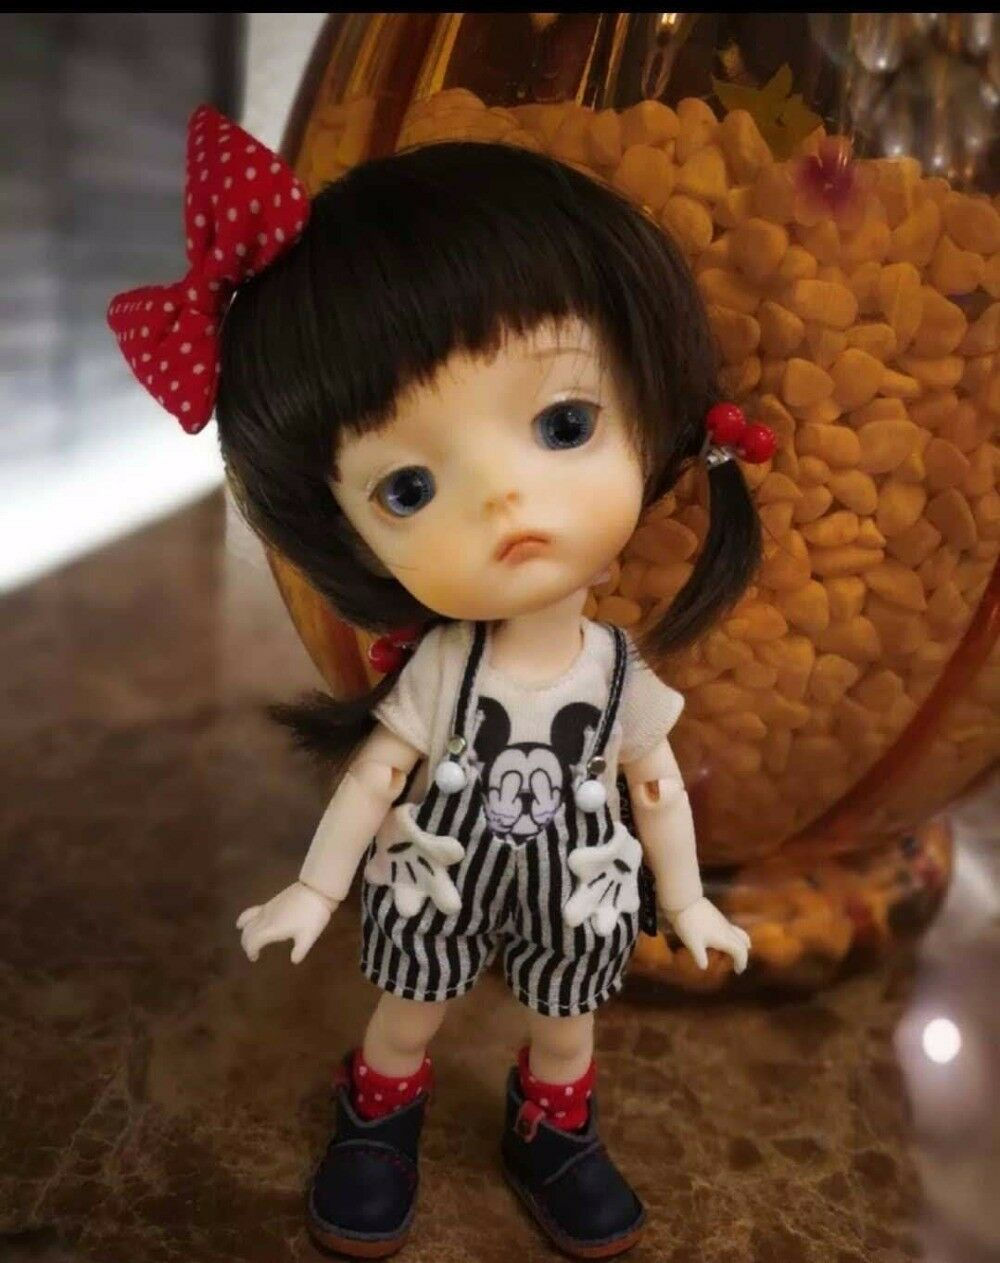 1 8 bjd doll Ming recast dollfie manga anime fairyland sd muñeca cute tiny